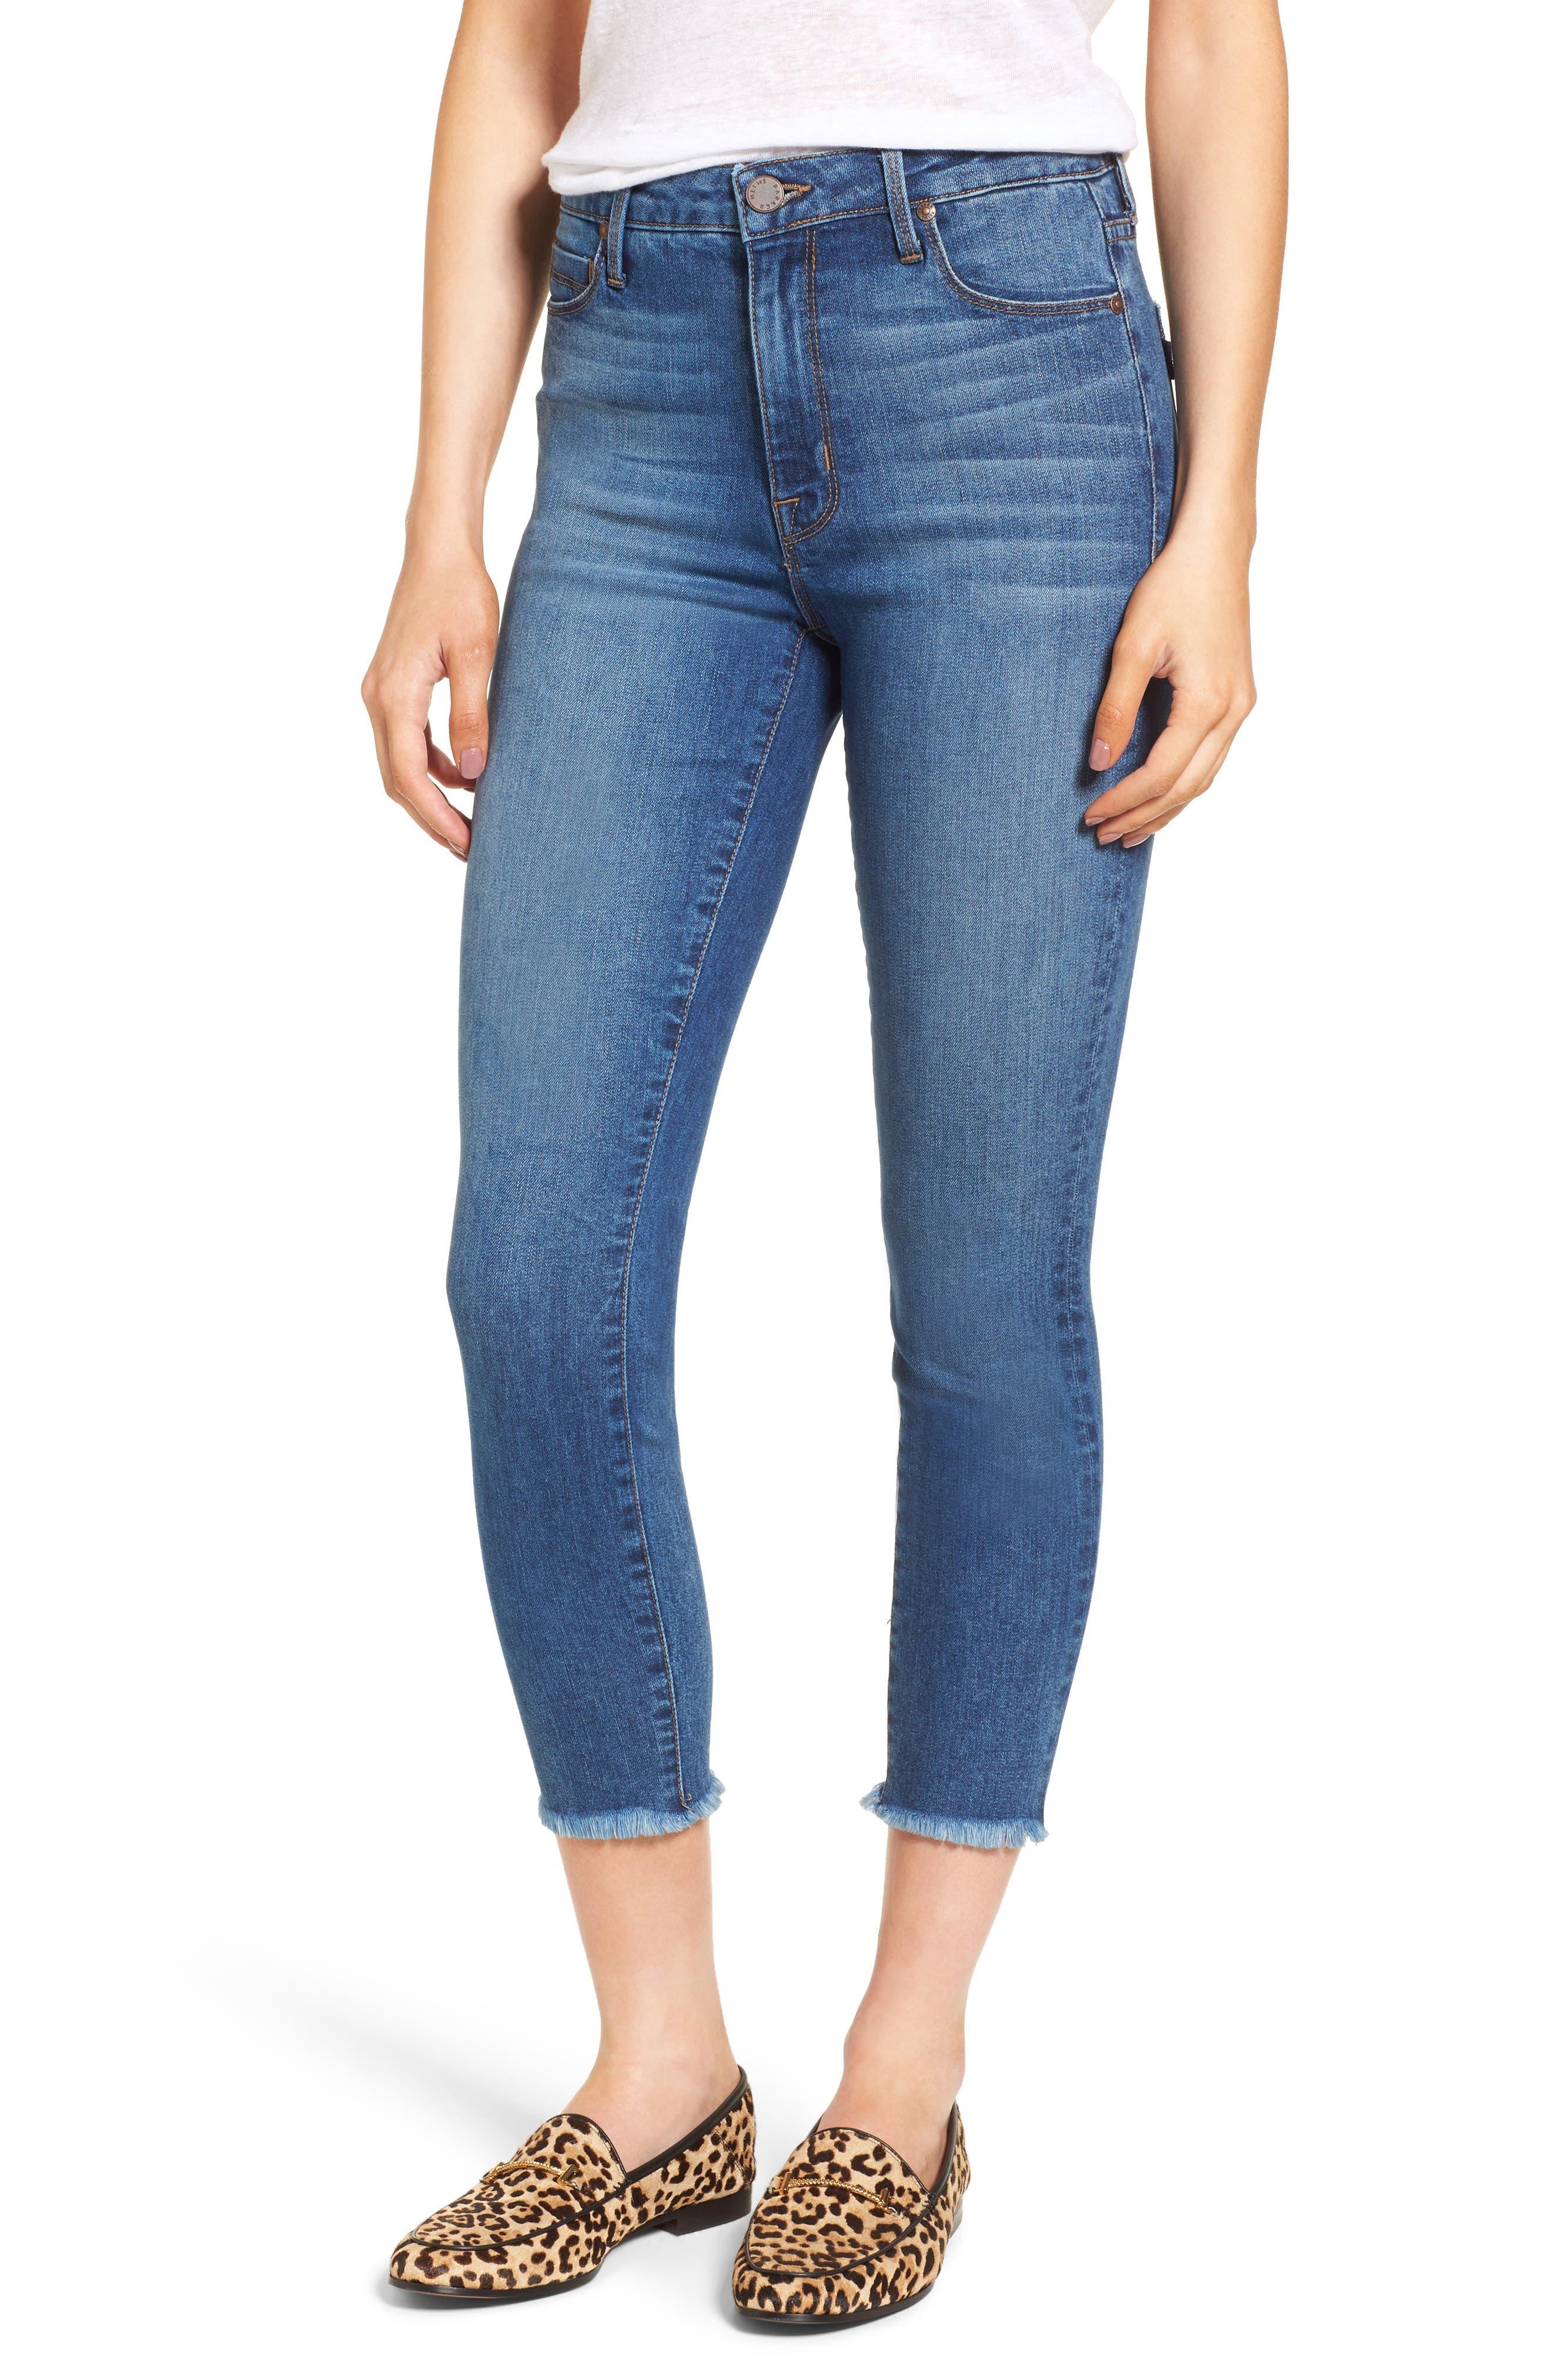 Main Image - PARKER SMITH Bombshell Raw Hem Stretch Skinny Jeans (Dawn)